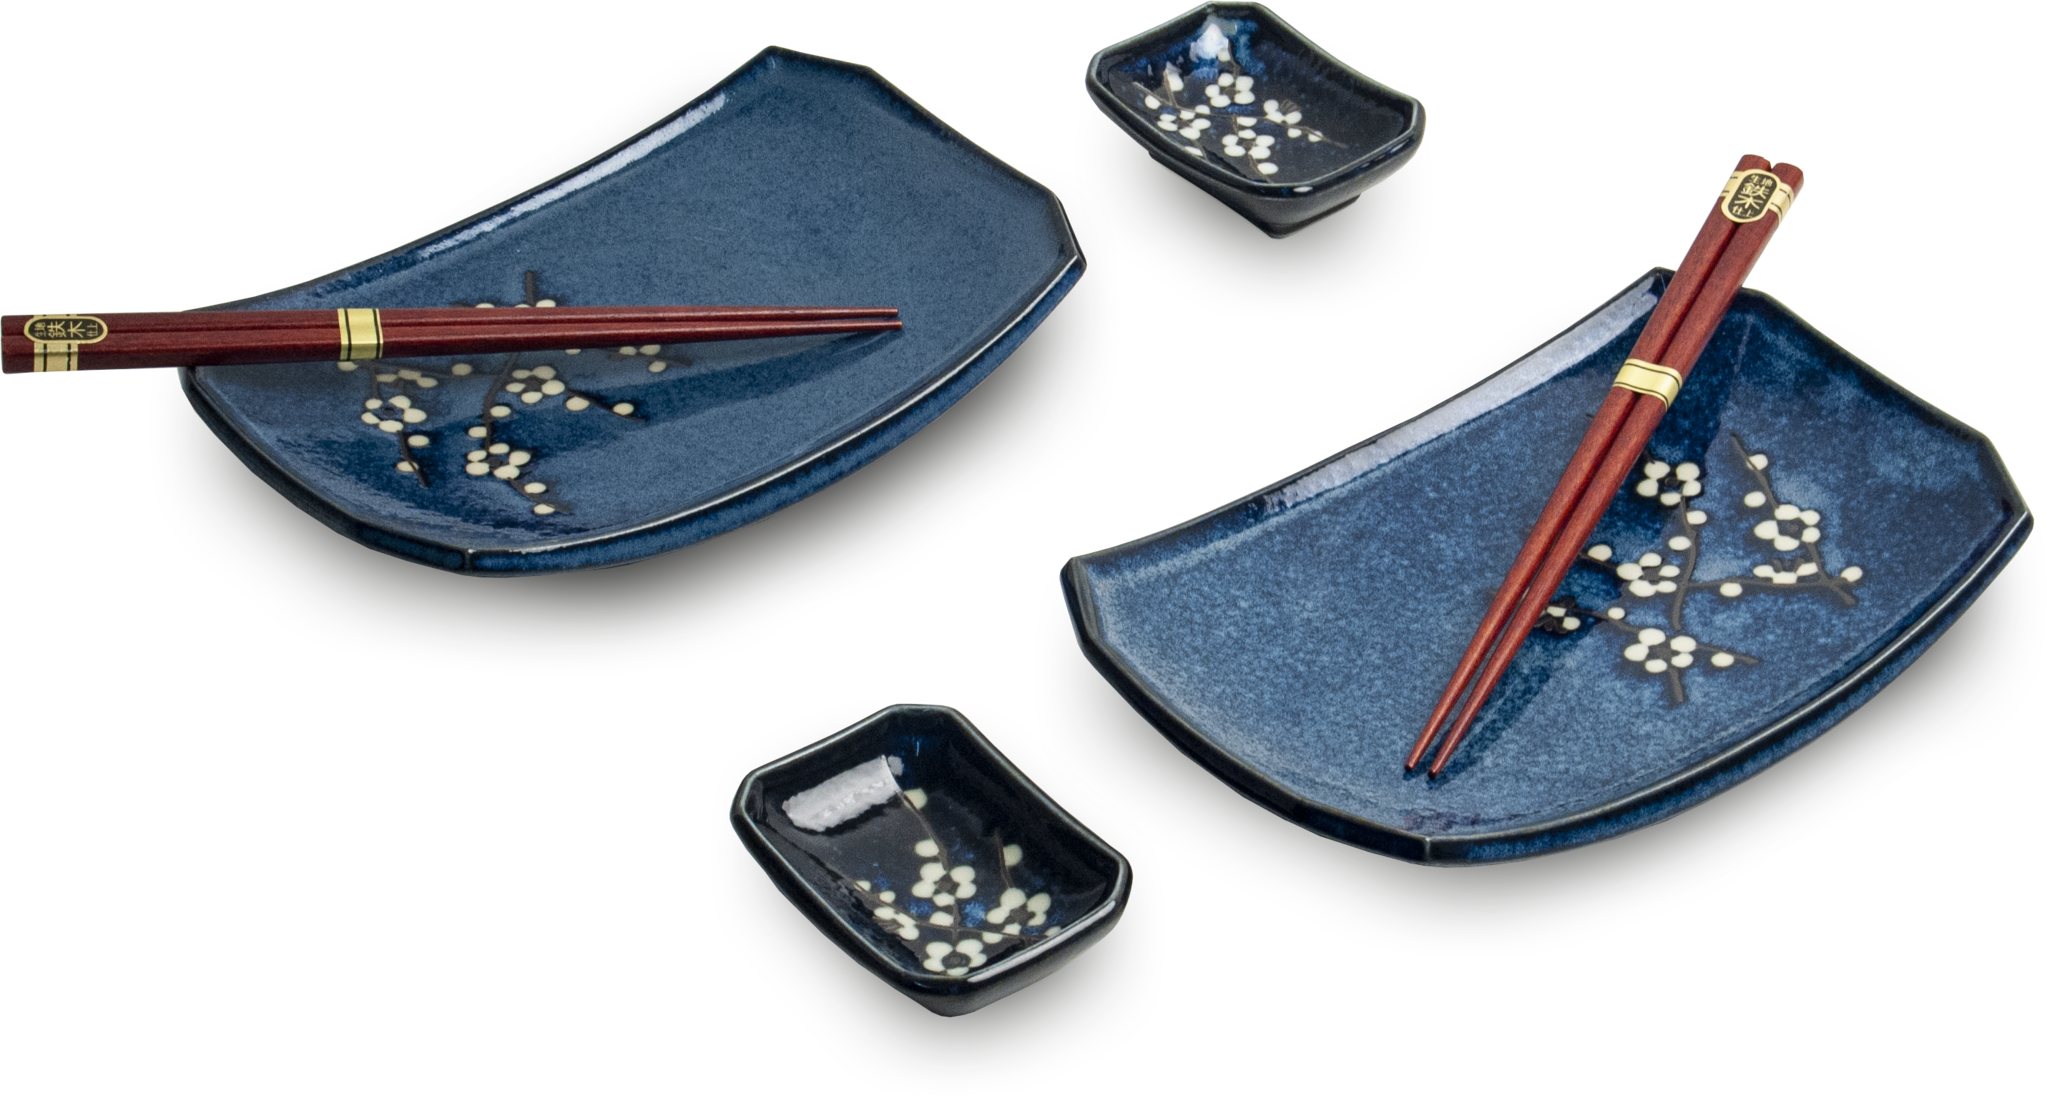 Edo Japan  Edo Japan   HANA BLUE   Authentic 6-piece Sushi Dinnerware Set   In Giftbox